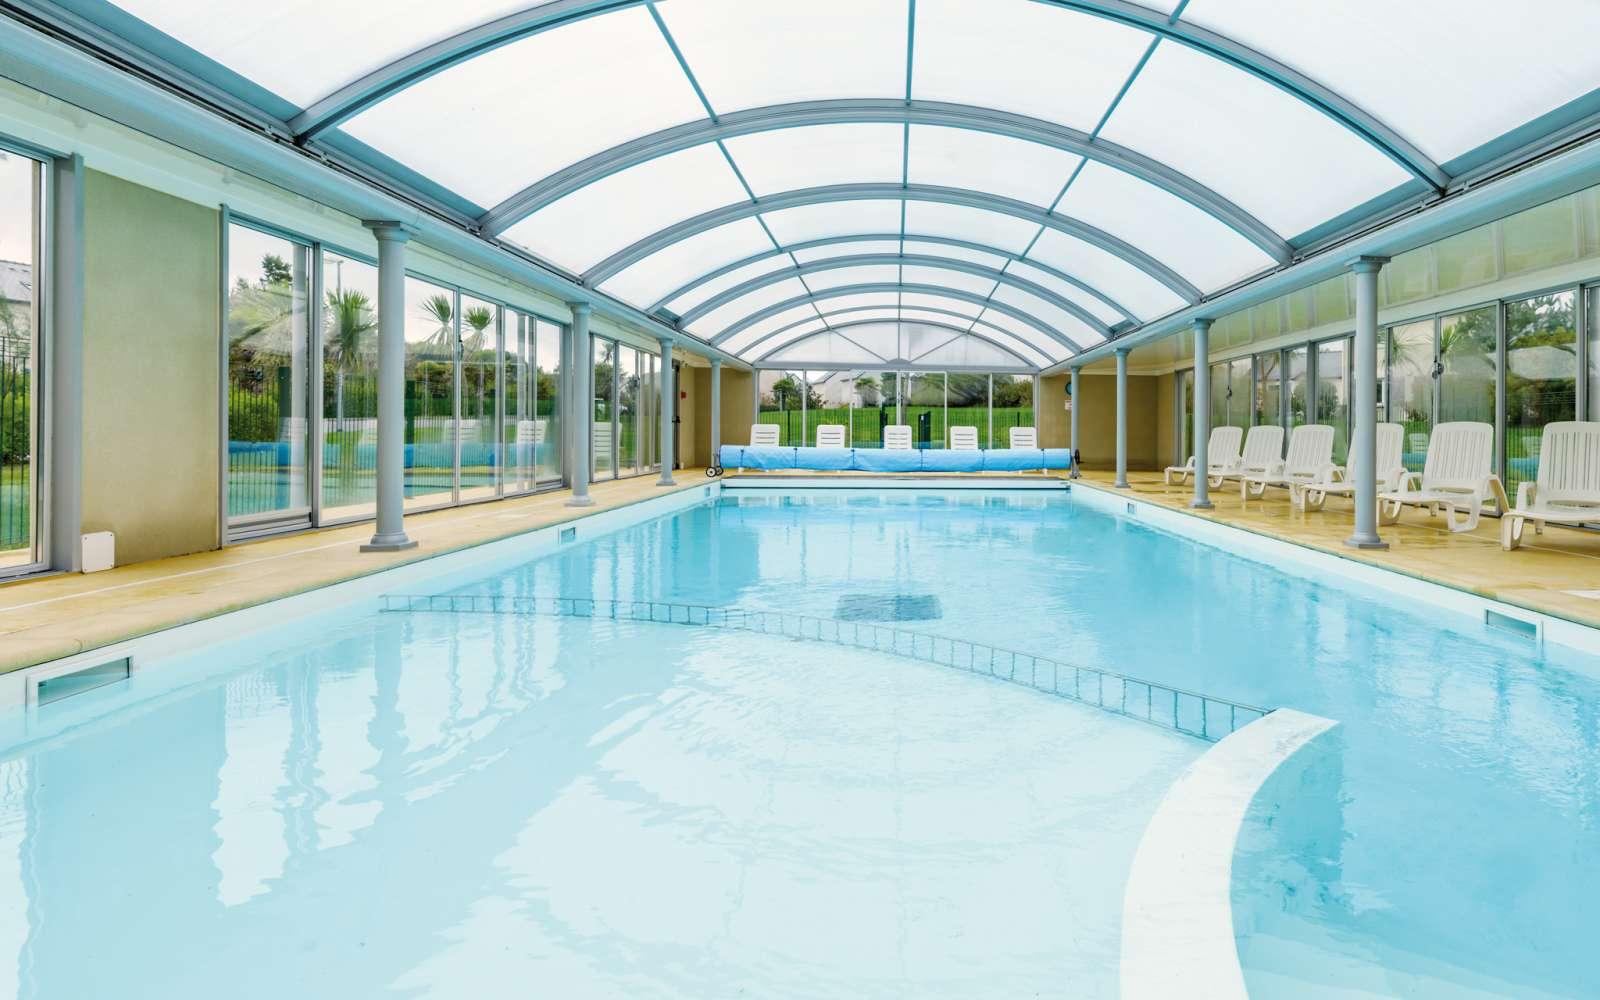 Location vacances avec piscine for Piscine audierne